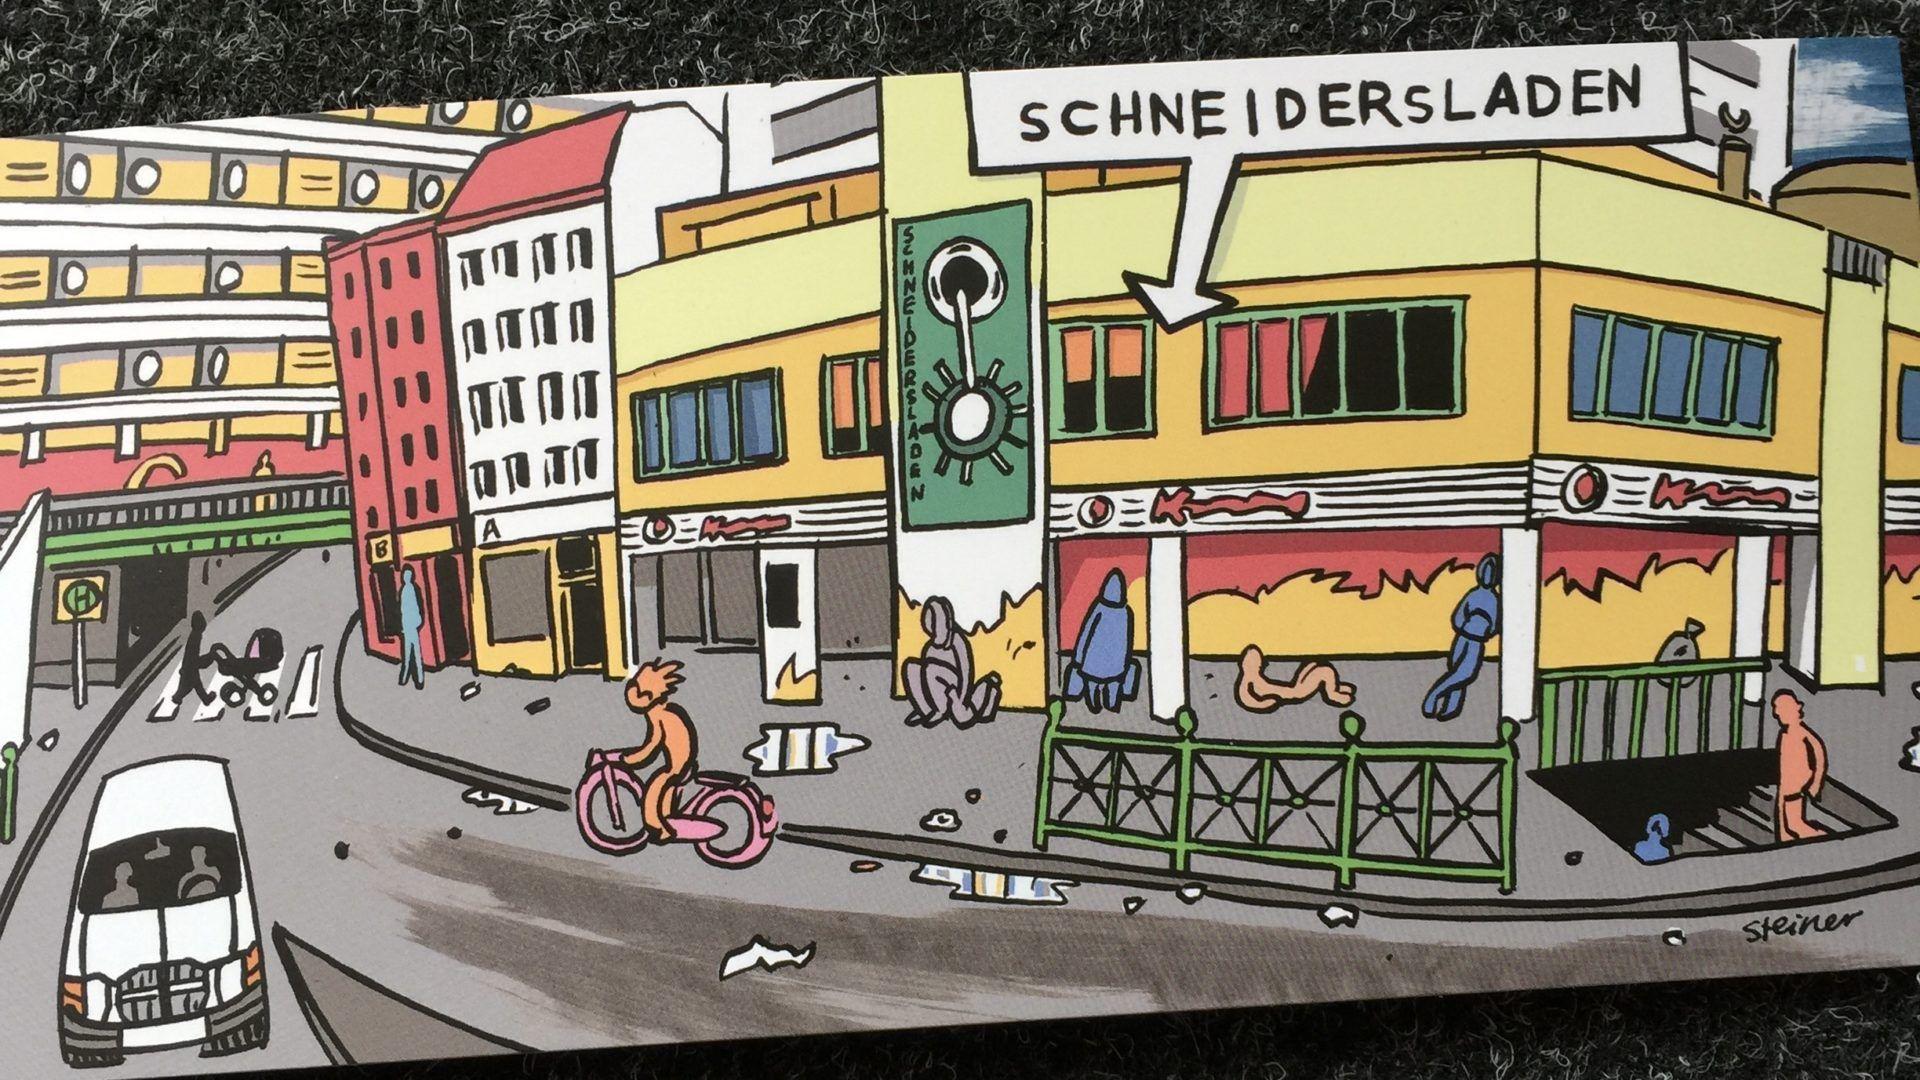 SchneidersLaden Berlin synth store cartoon